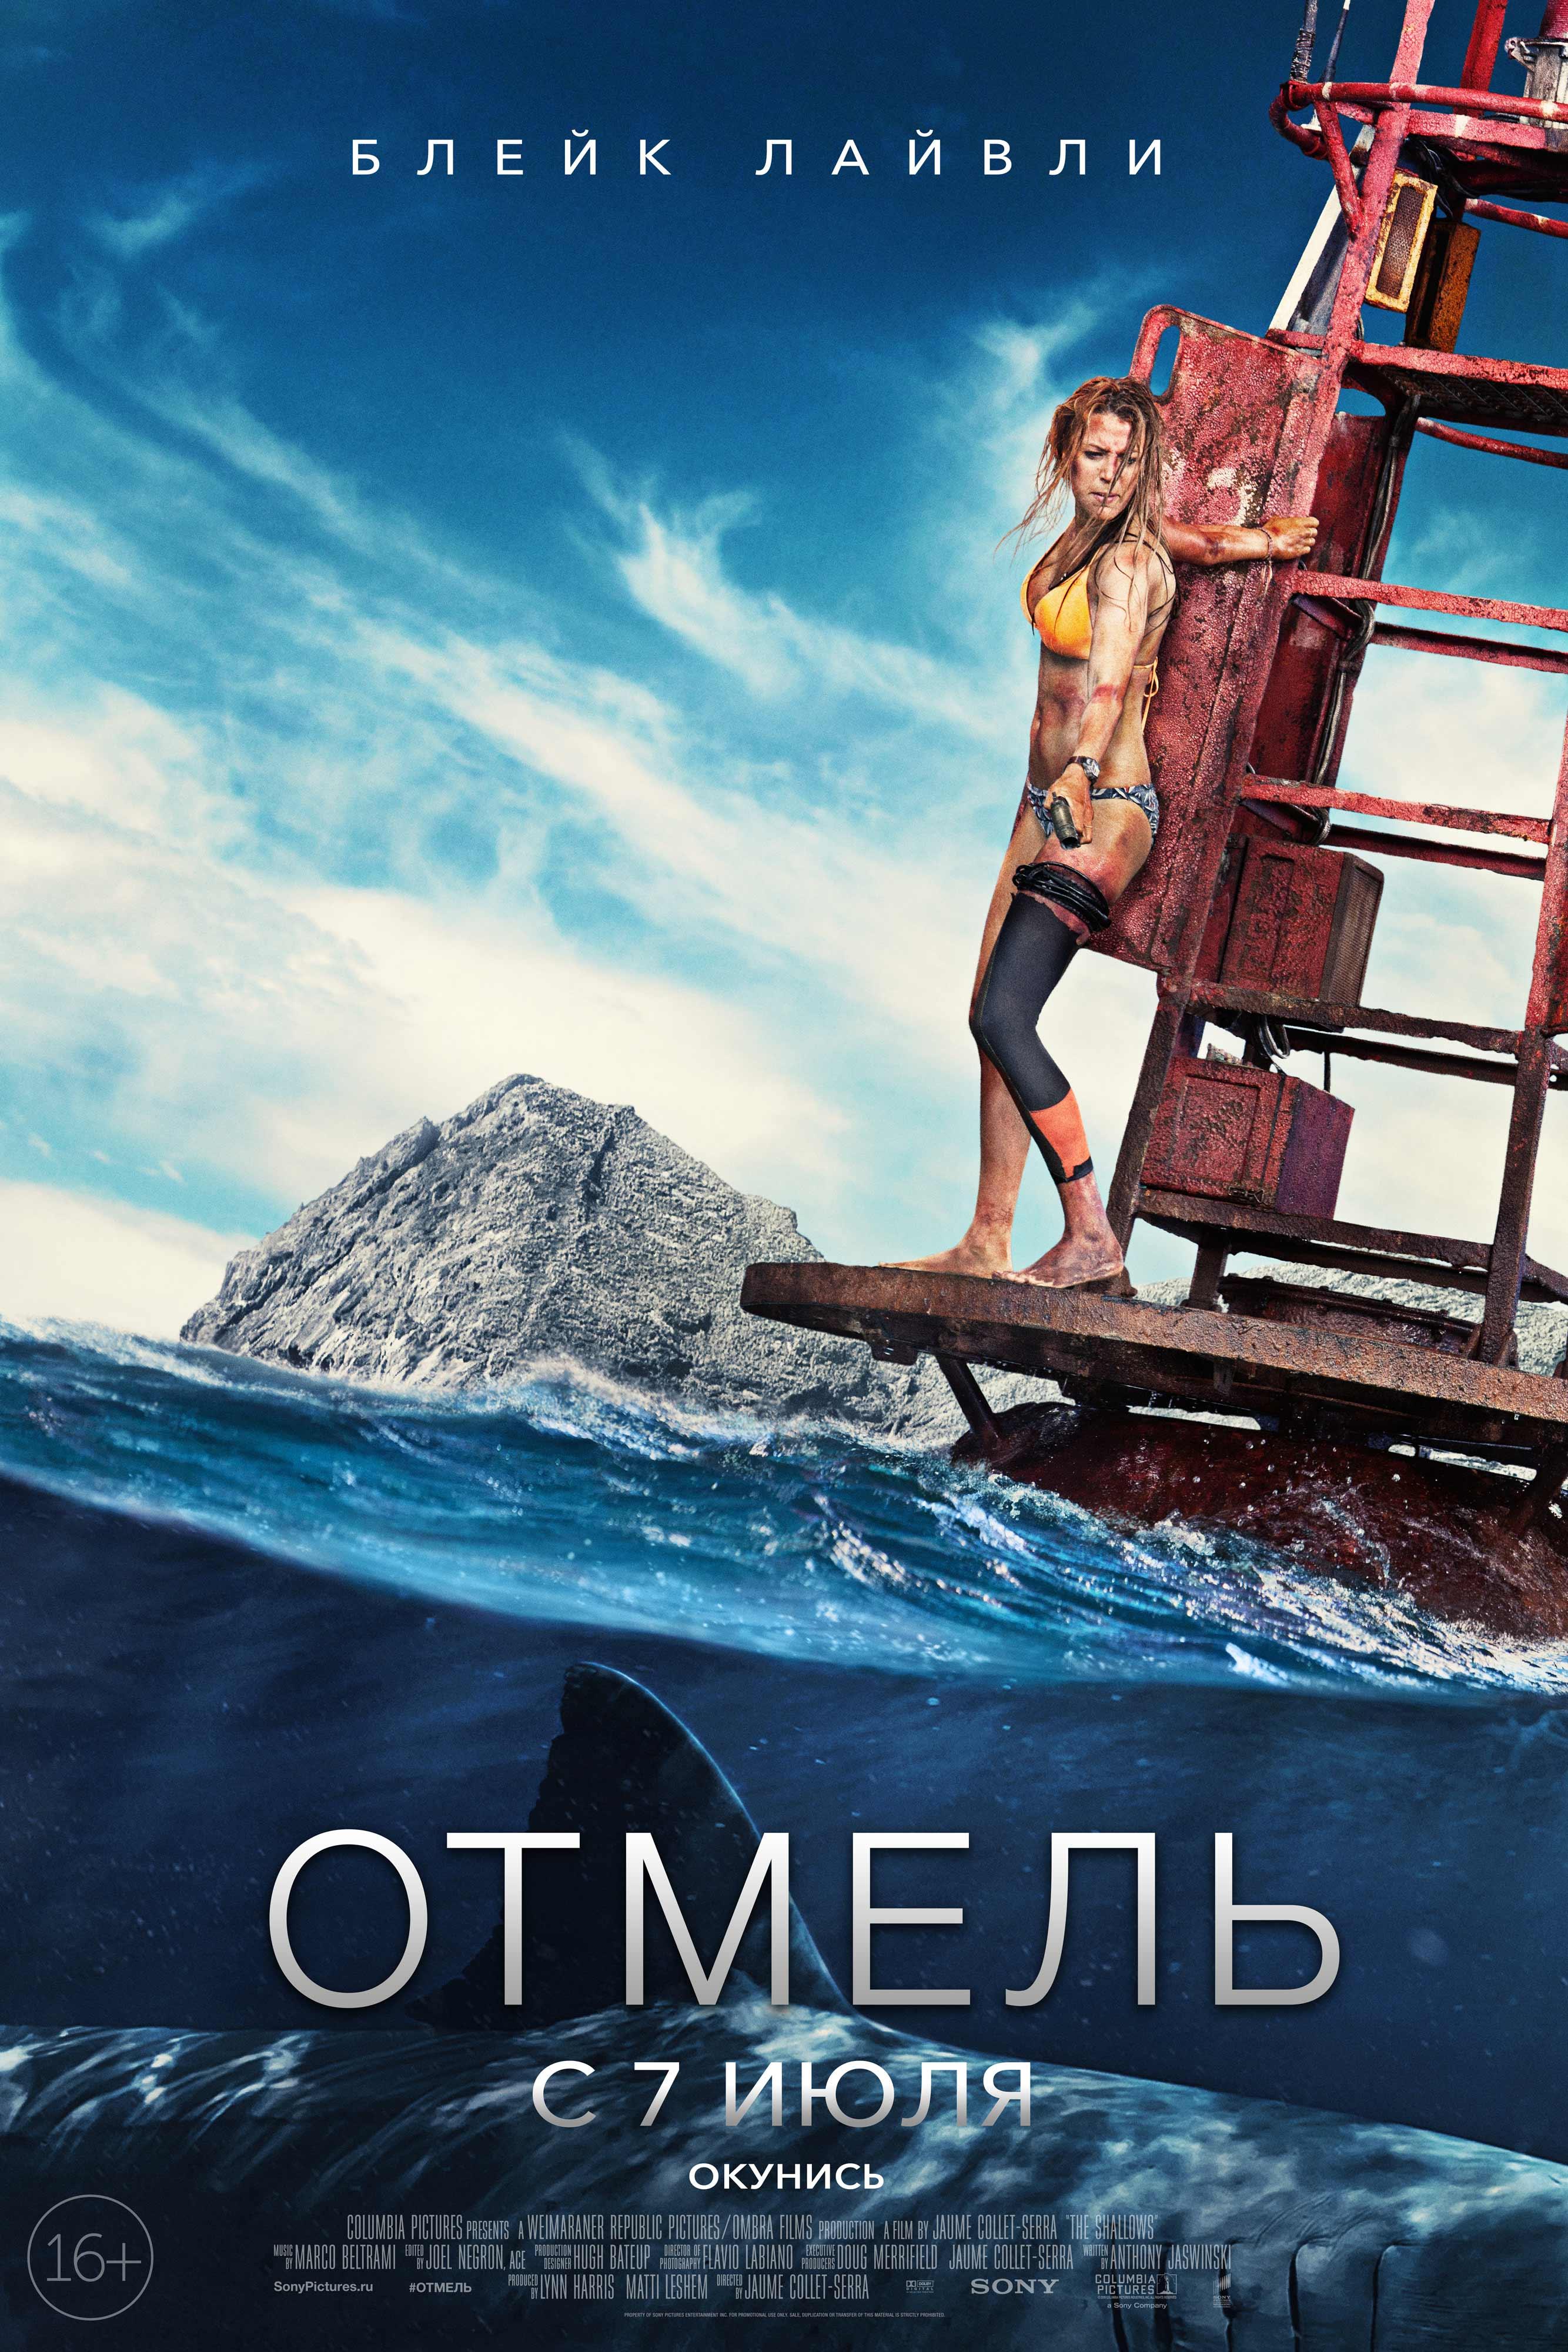 «Океан Сериал 1989» — 2008